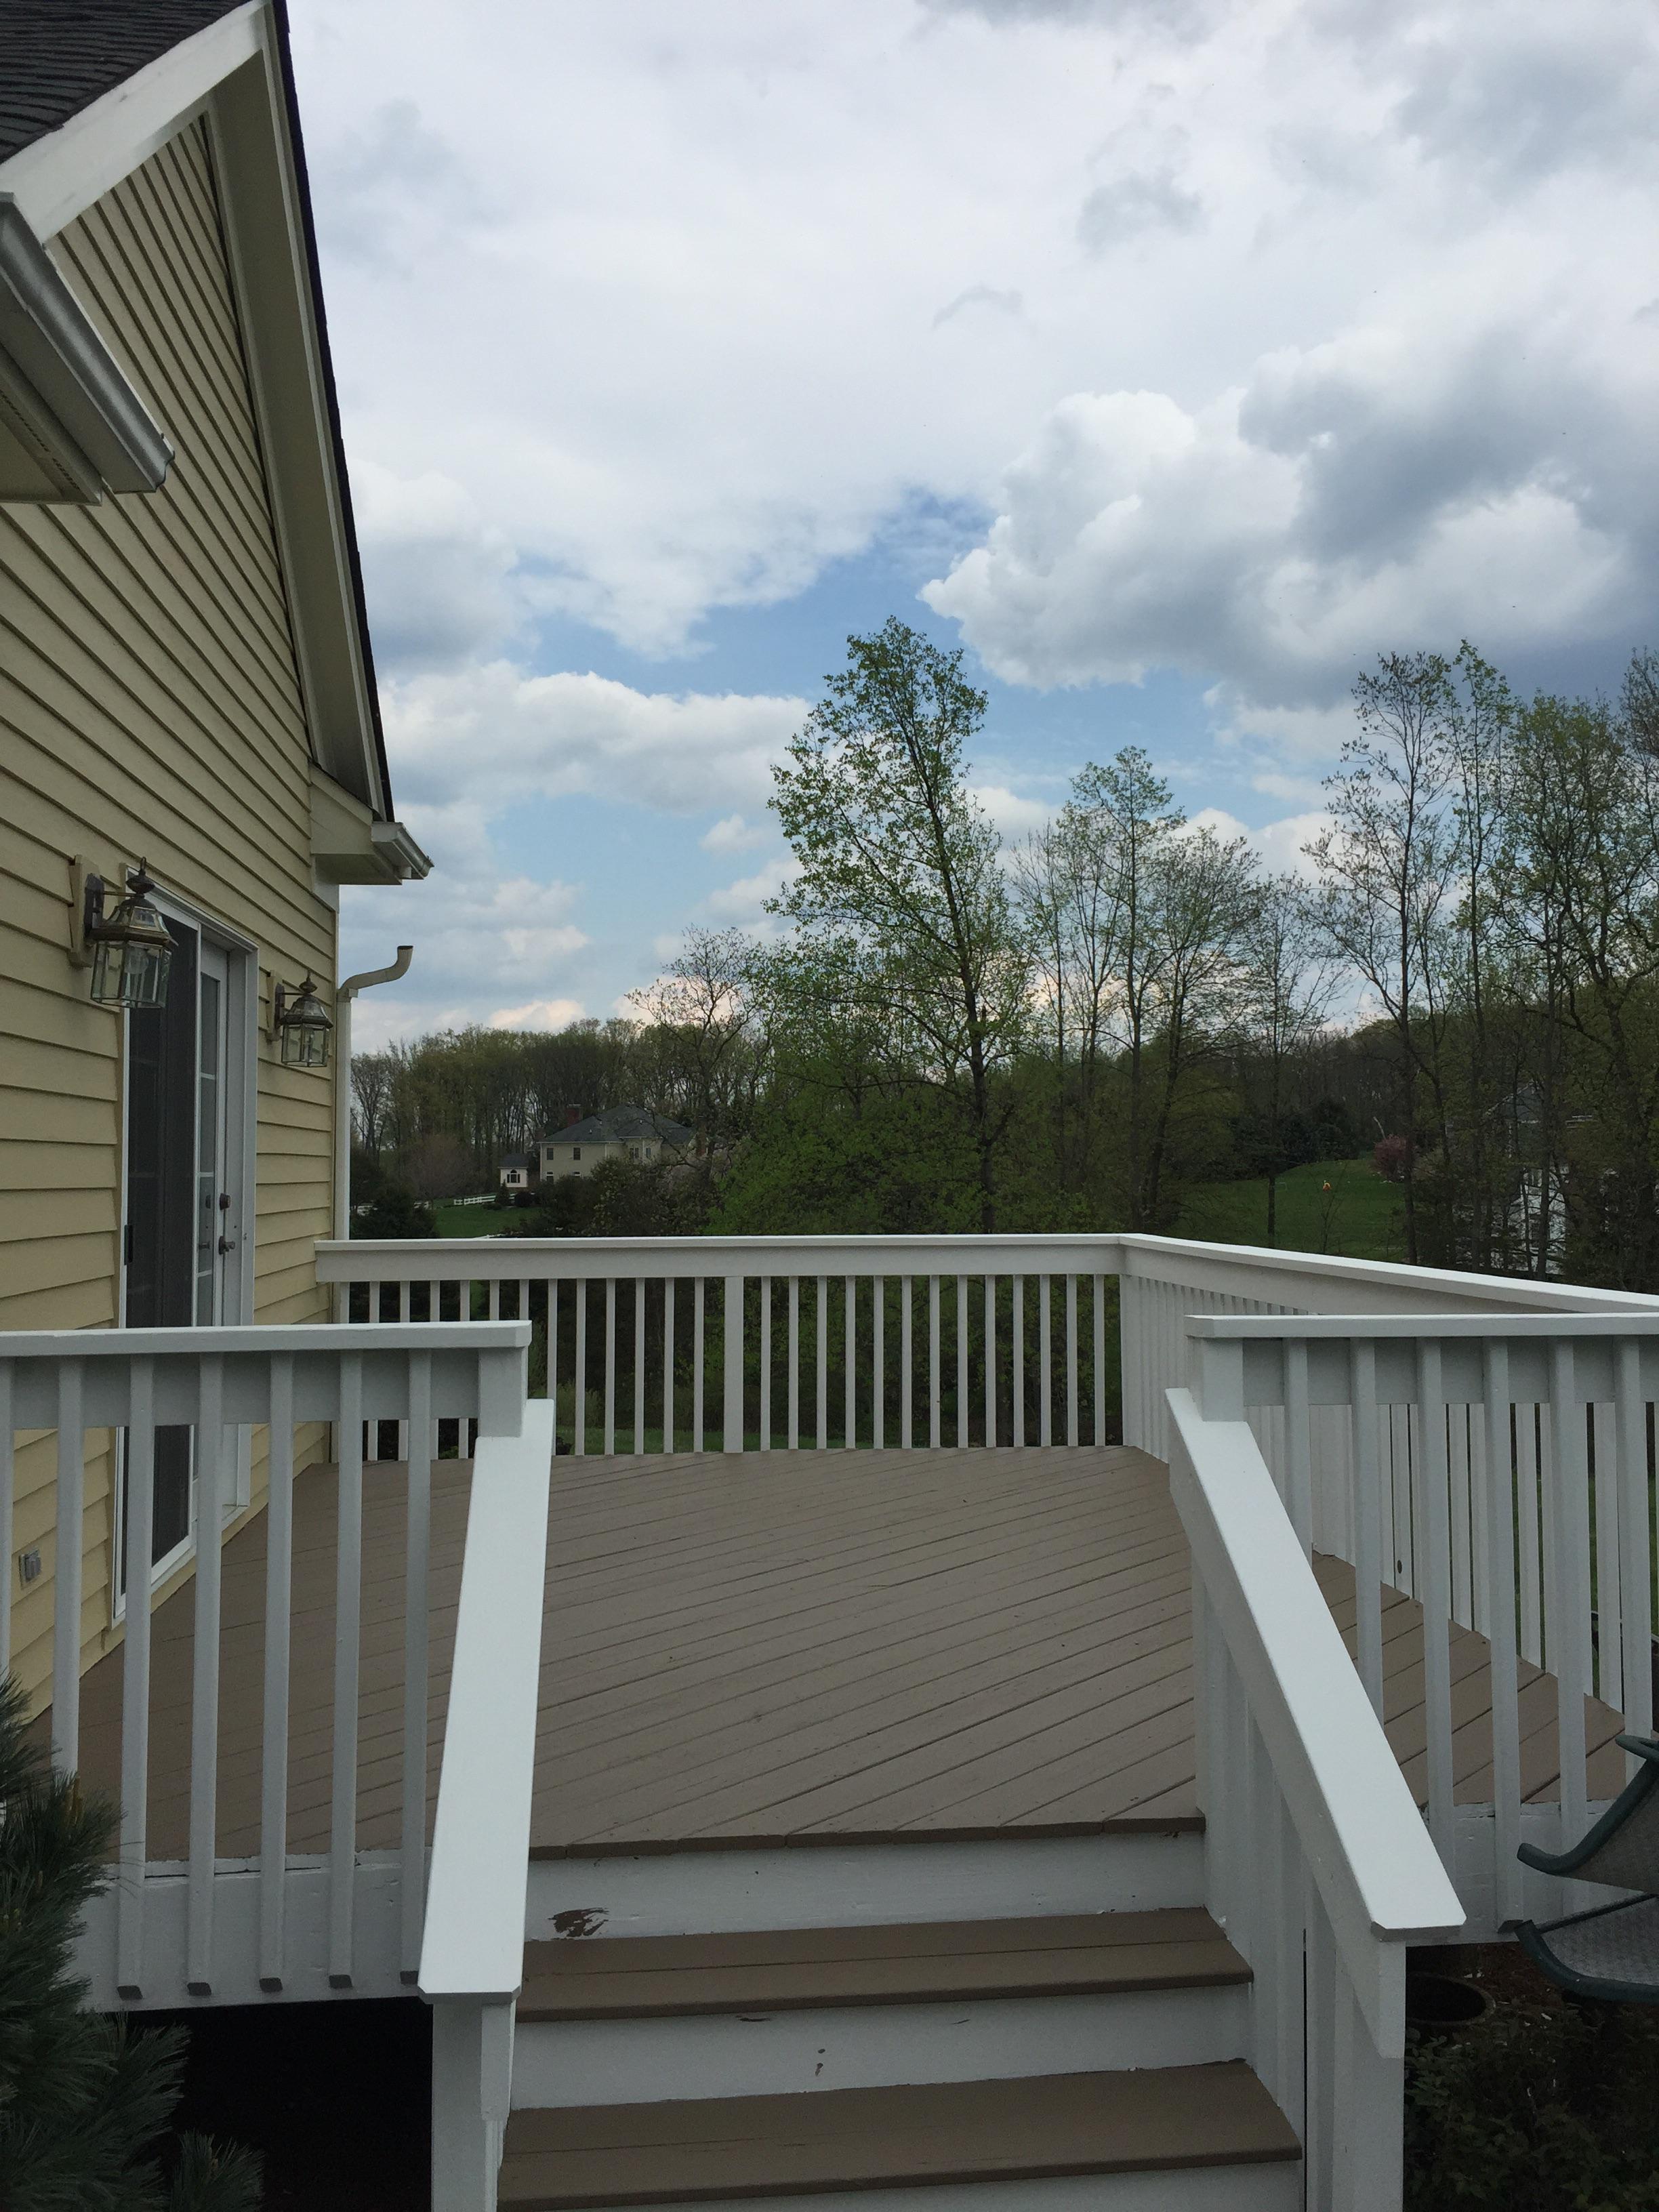 Ruamal Painting And Home Maintenance LLC image 6